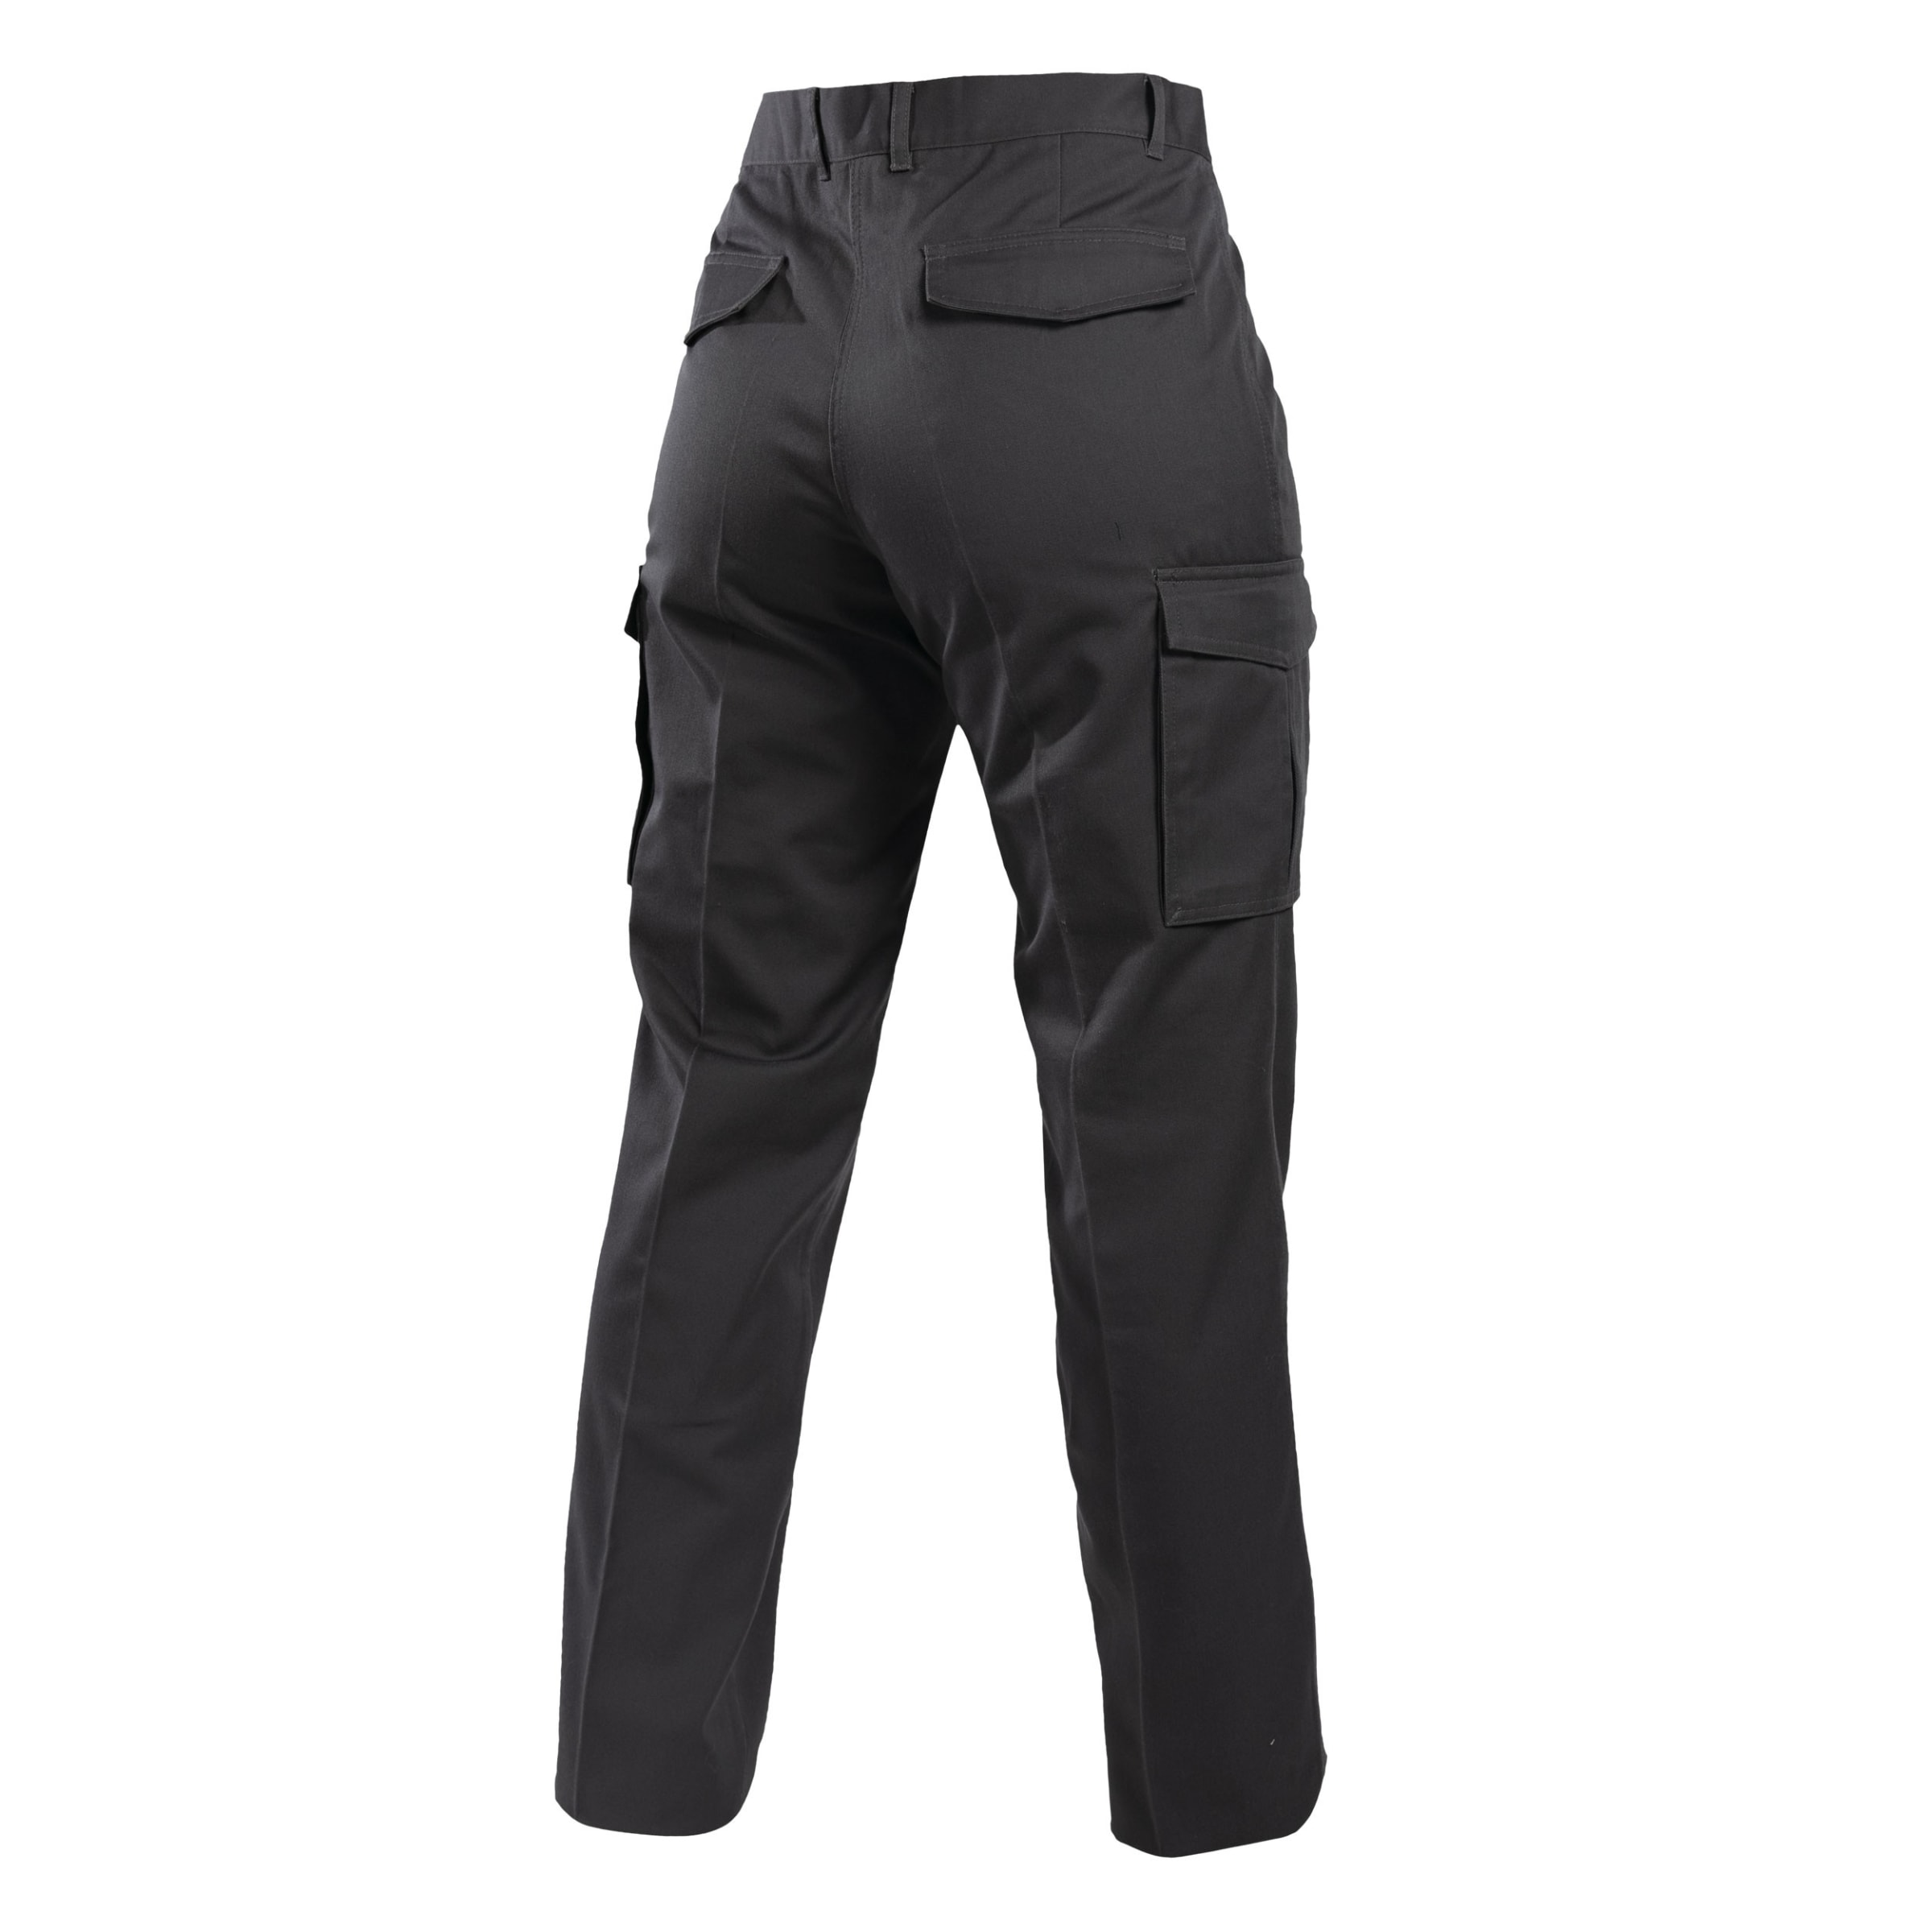 Pantalon Cargo Classic Mujer Negro 10127 Uniformes Work